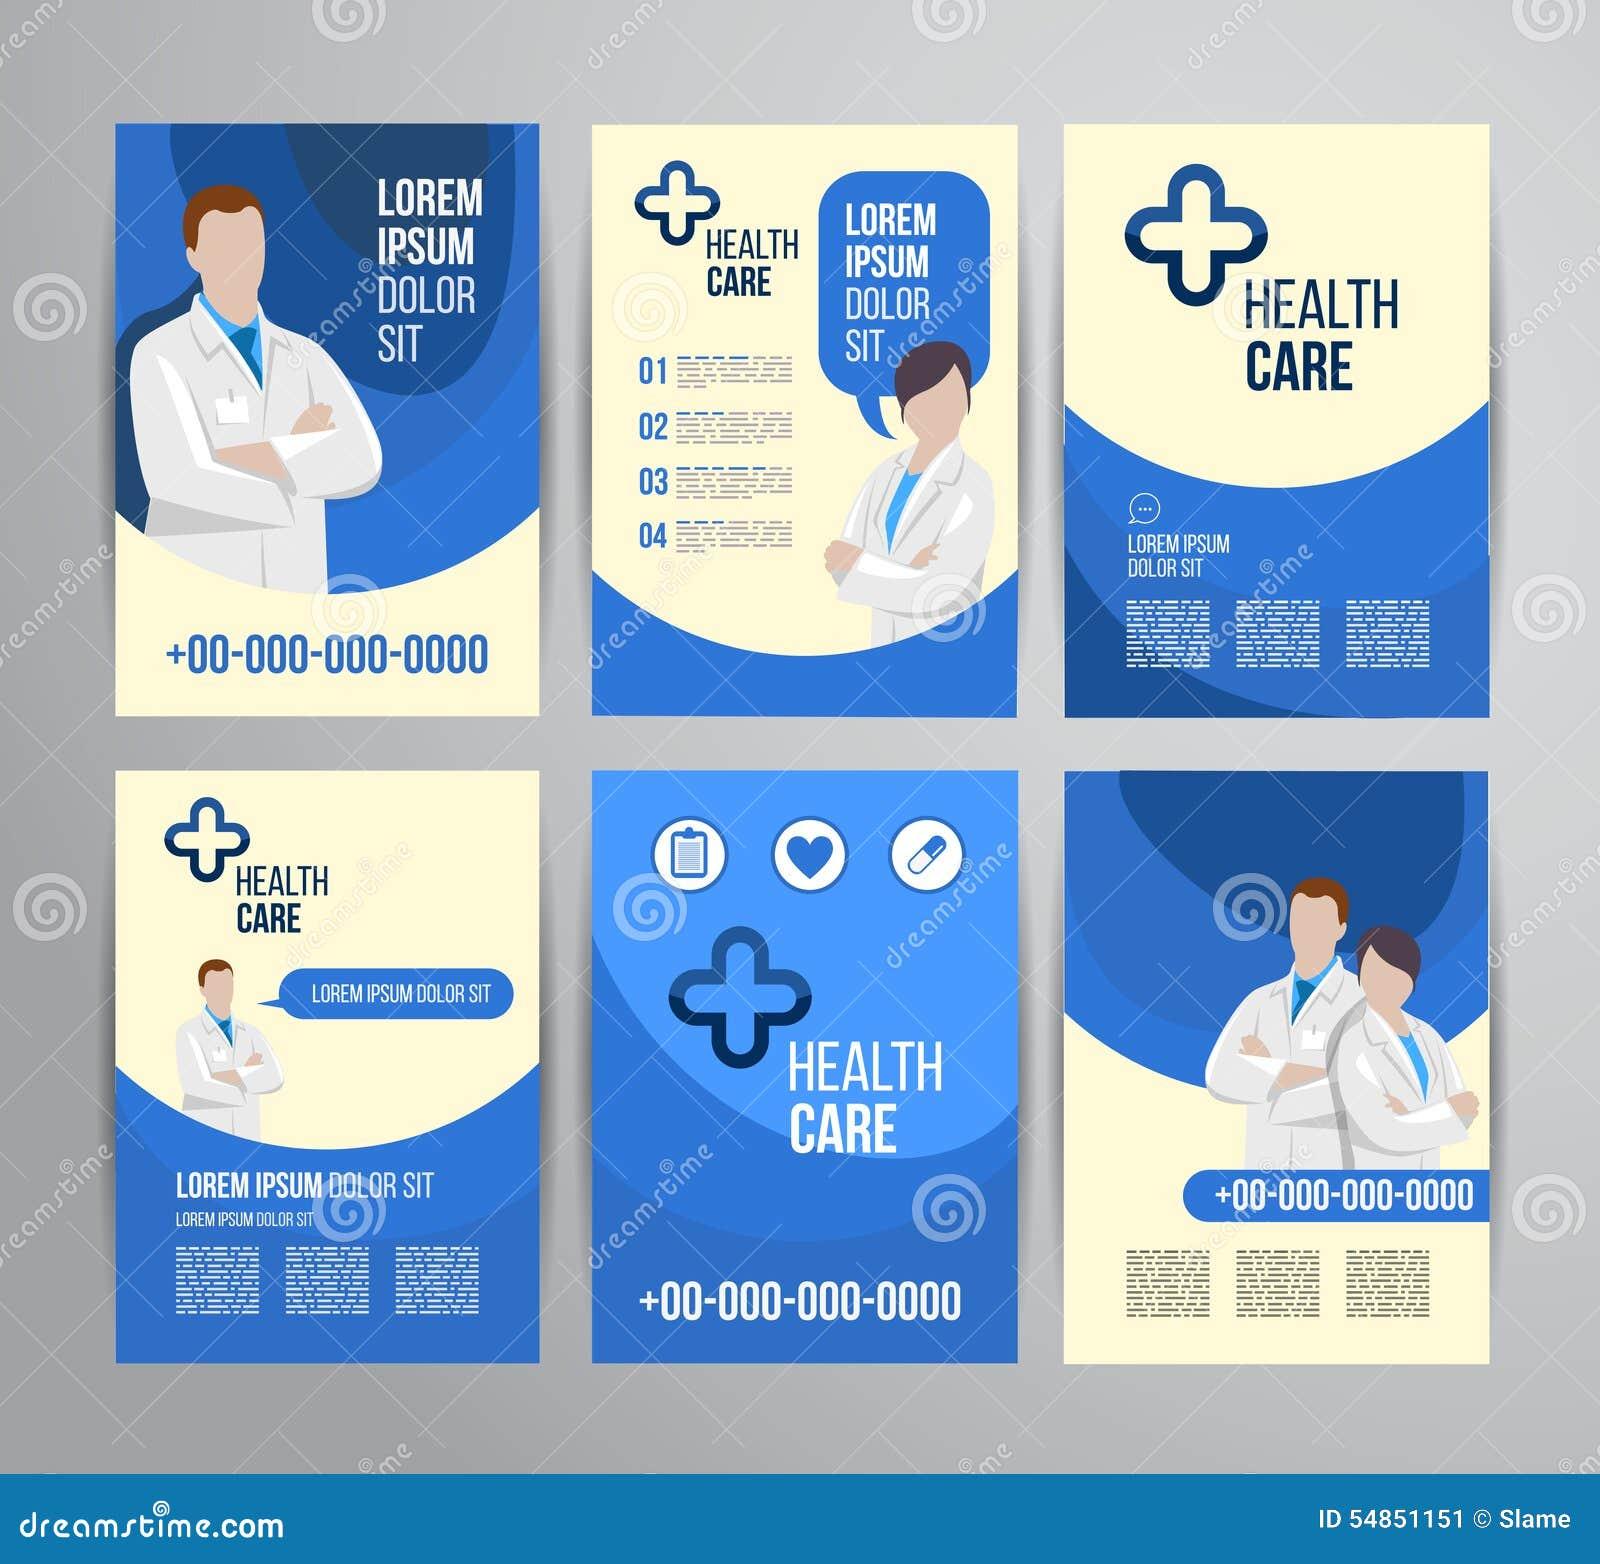 Healthcare Brochure Photo Image 54851151 – Healthcare Brochure